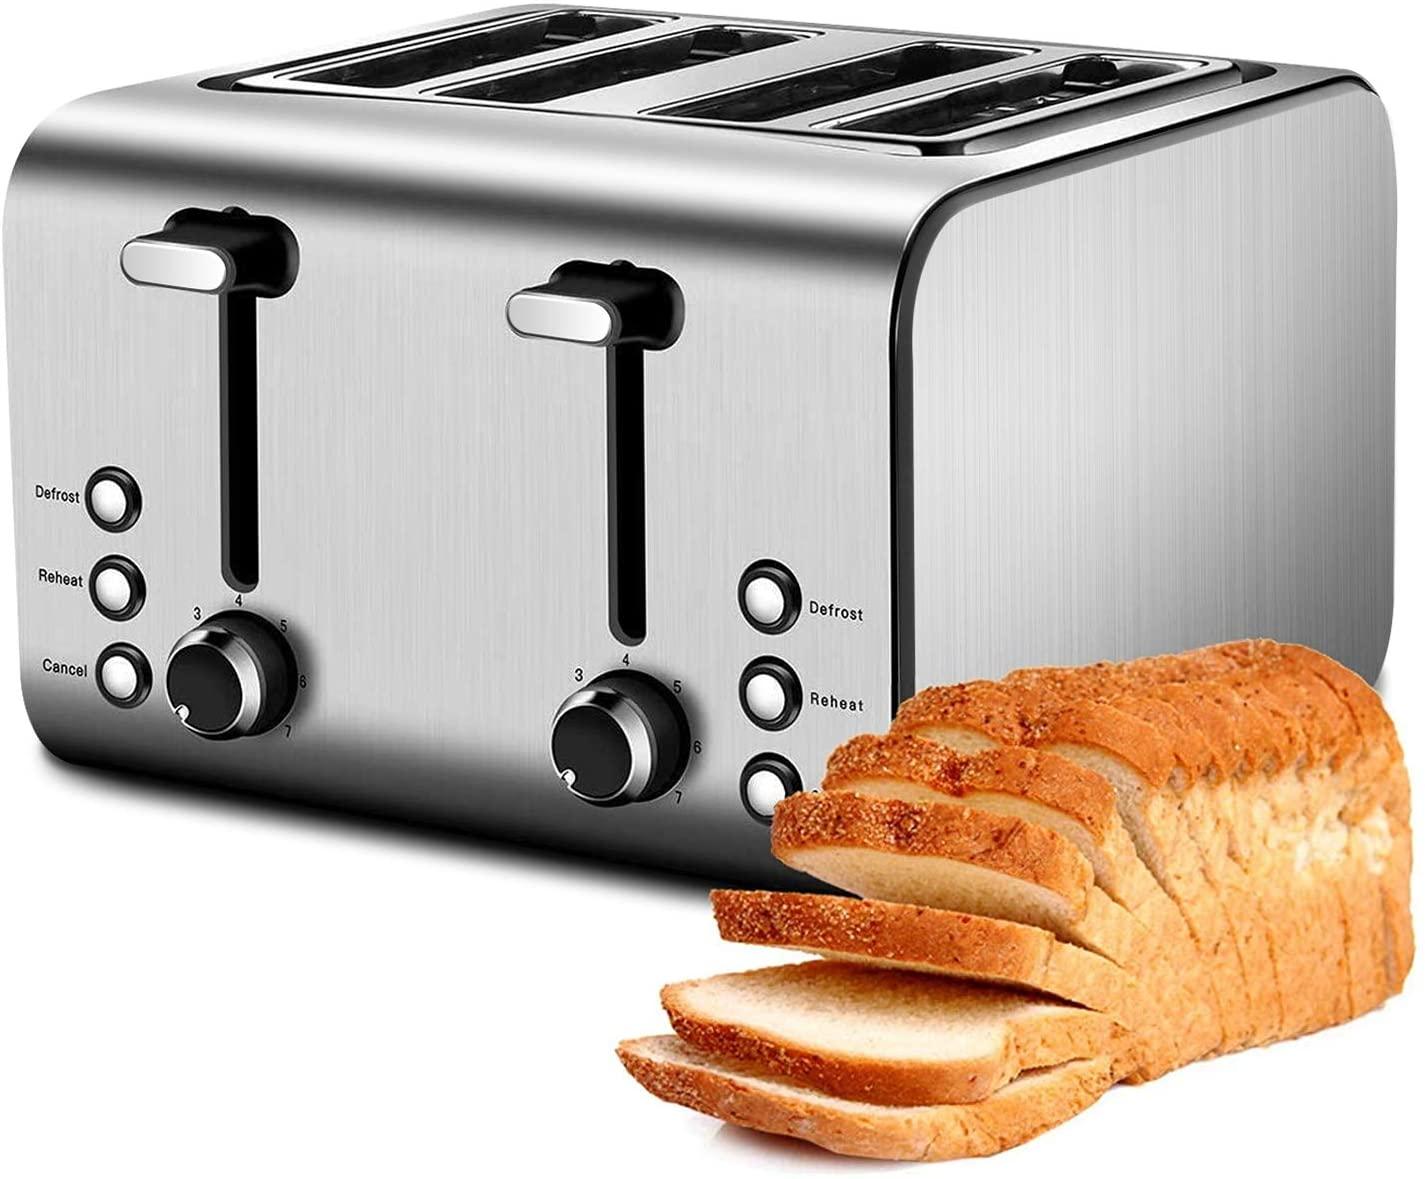 Barsetto Gevi 4 Slice Toaster